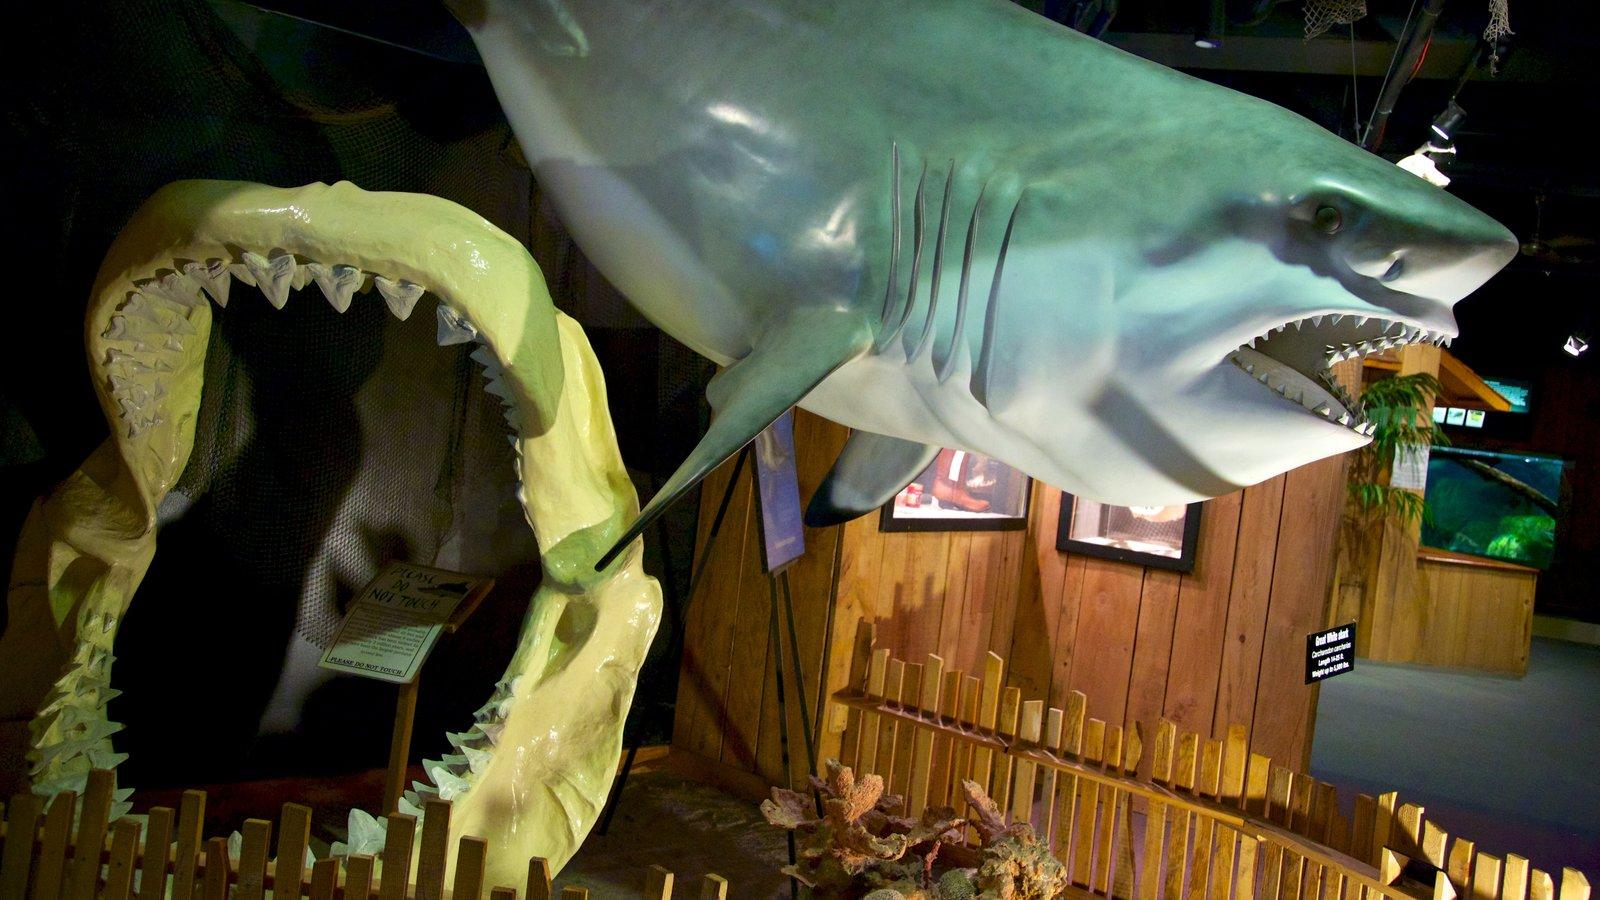 Fish aquarium in niagara falls - Aquarium Of Niagara Showing Marine Life And Interior Views